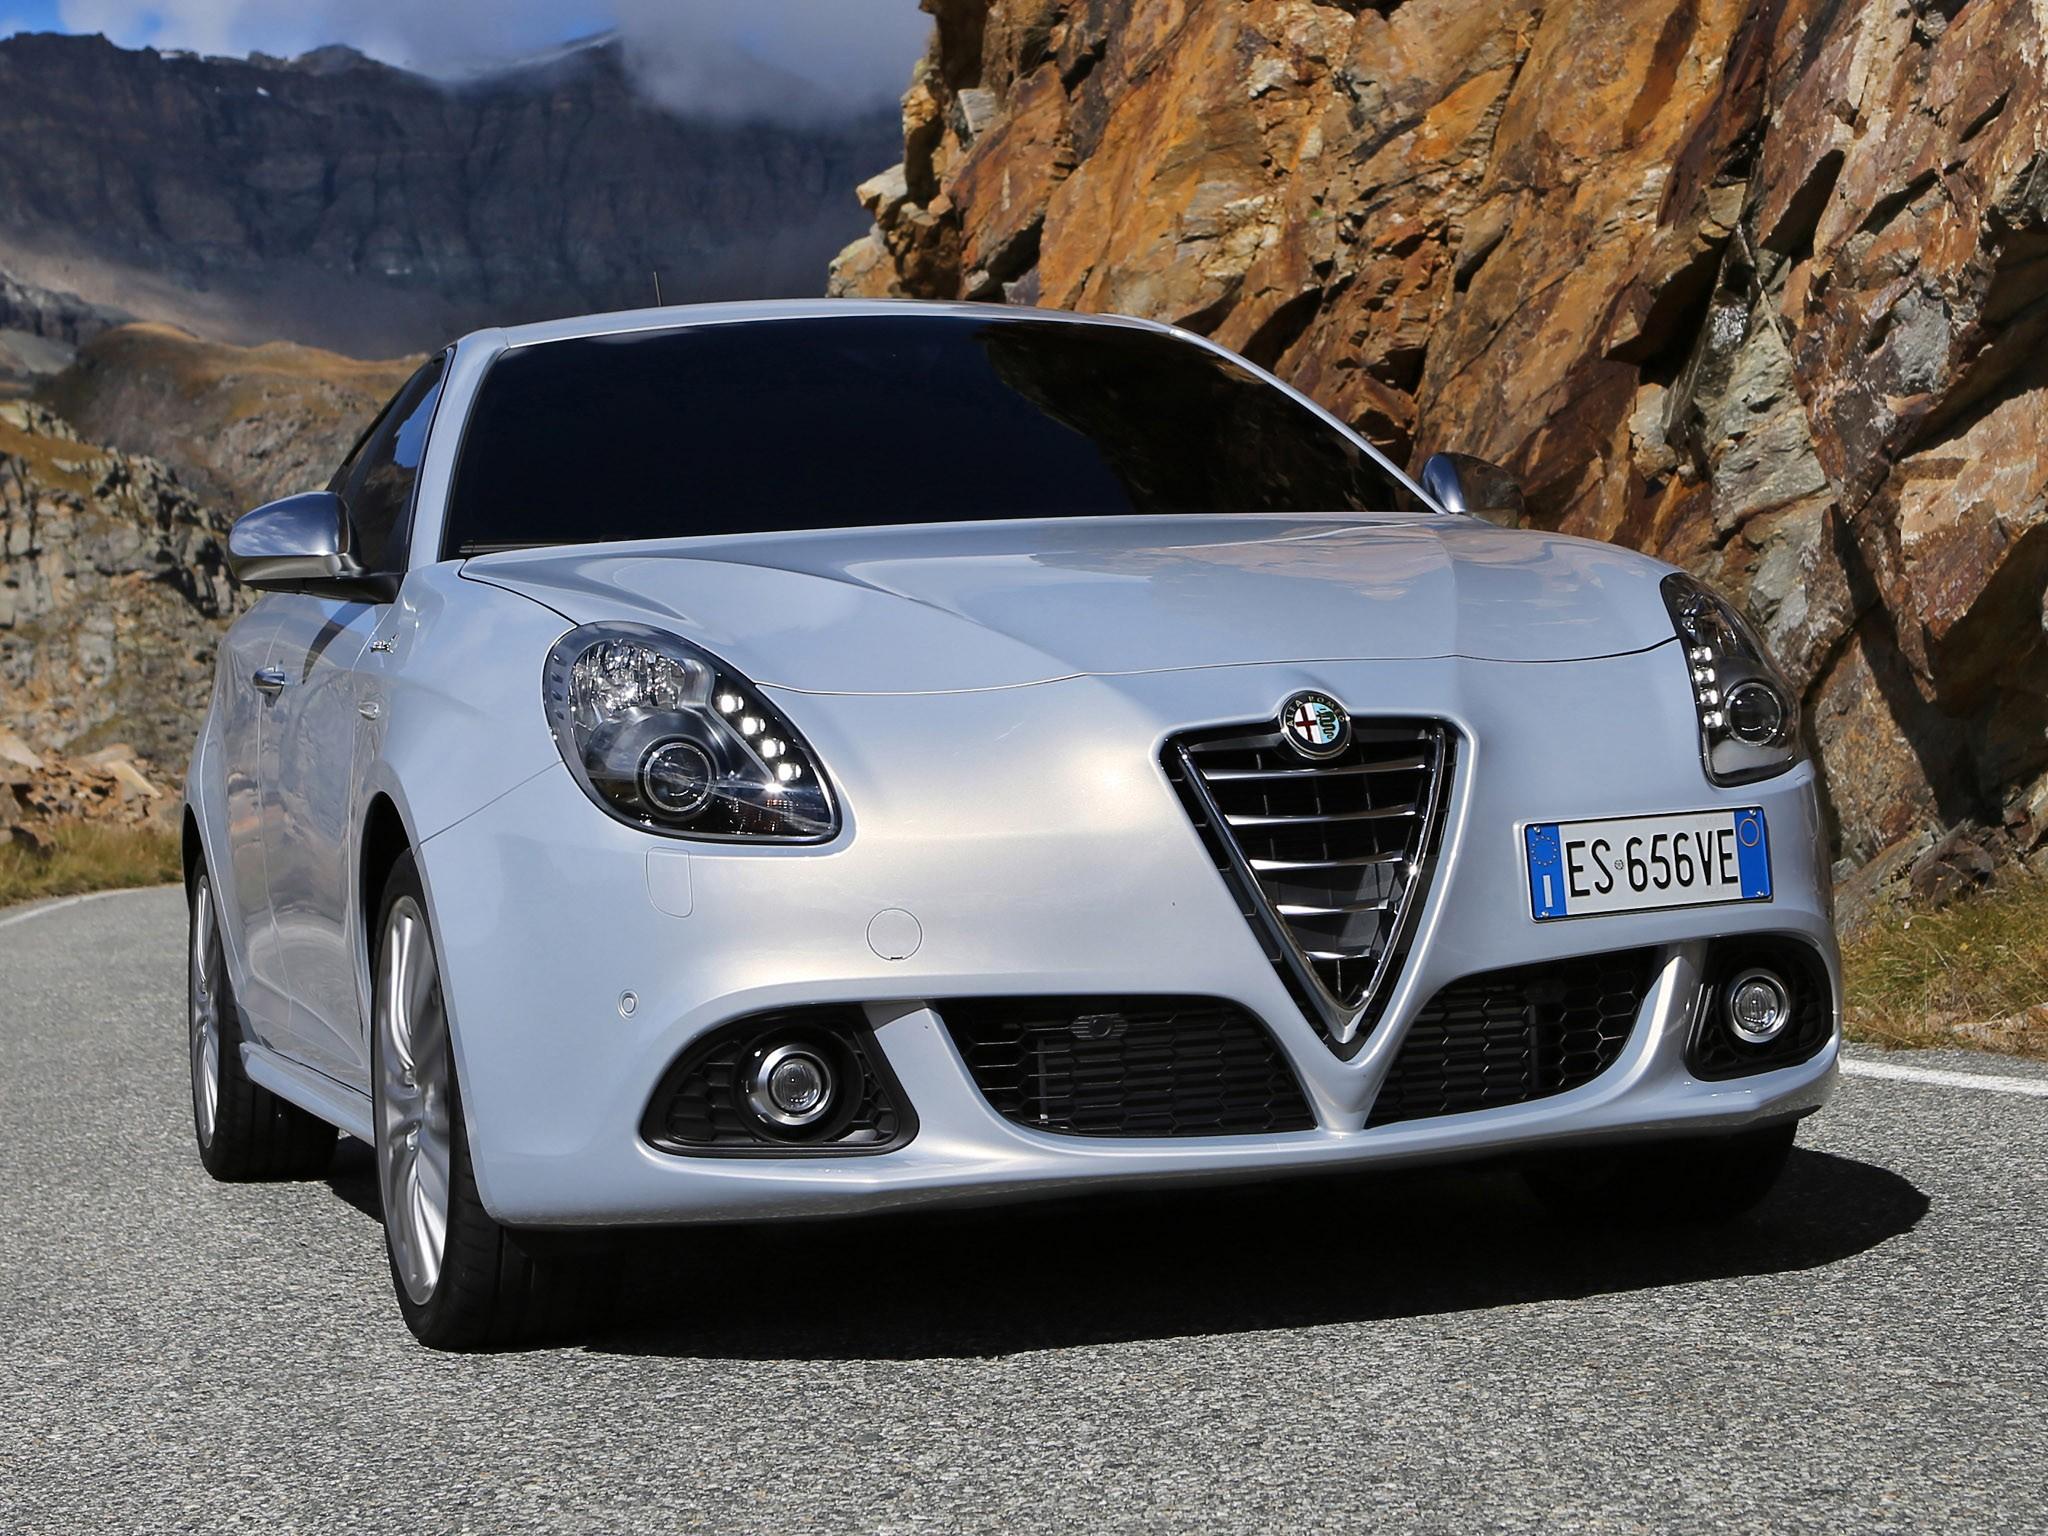 2014 Alfa Romeo Giulietta Sportiva